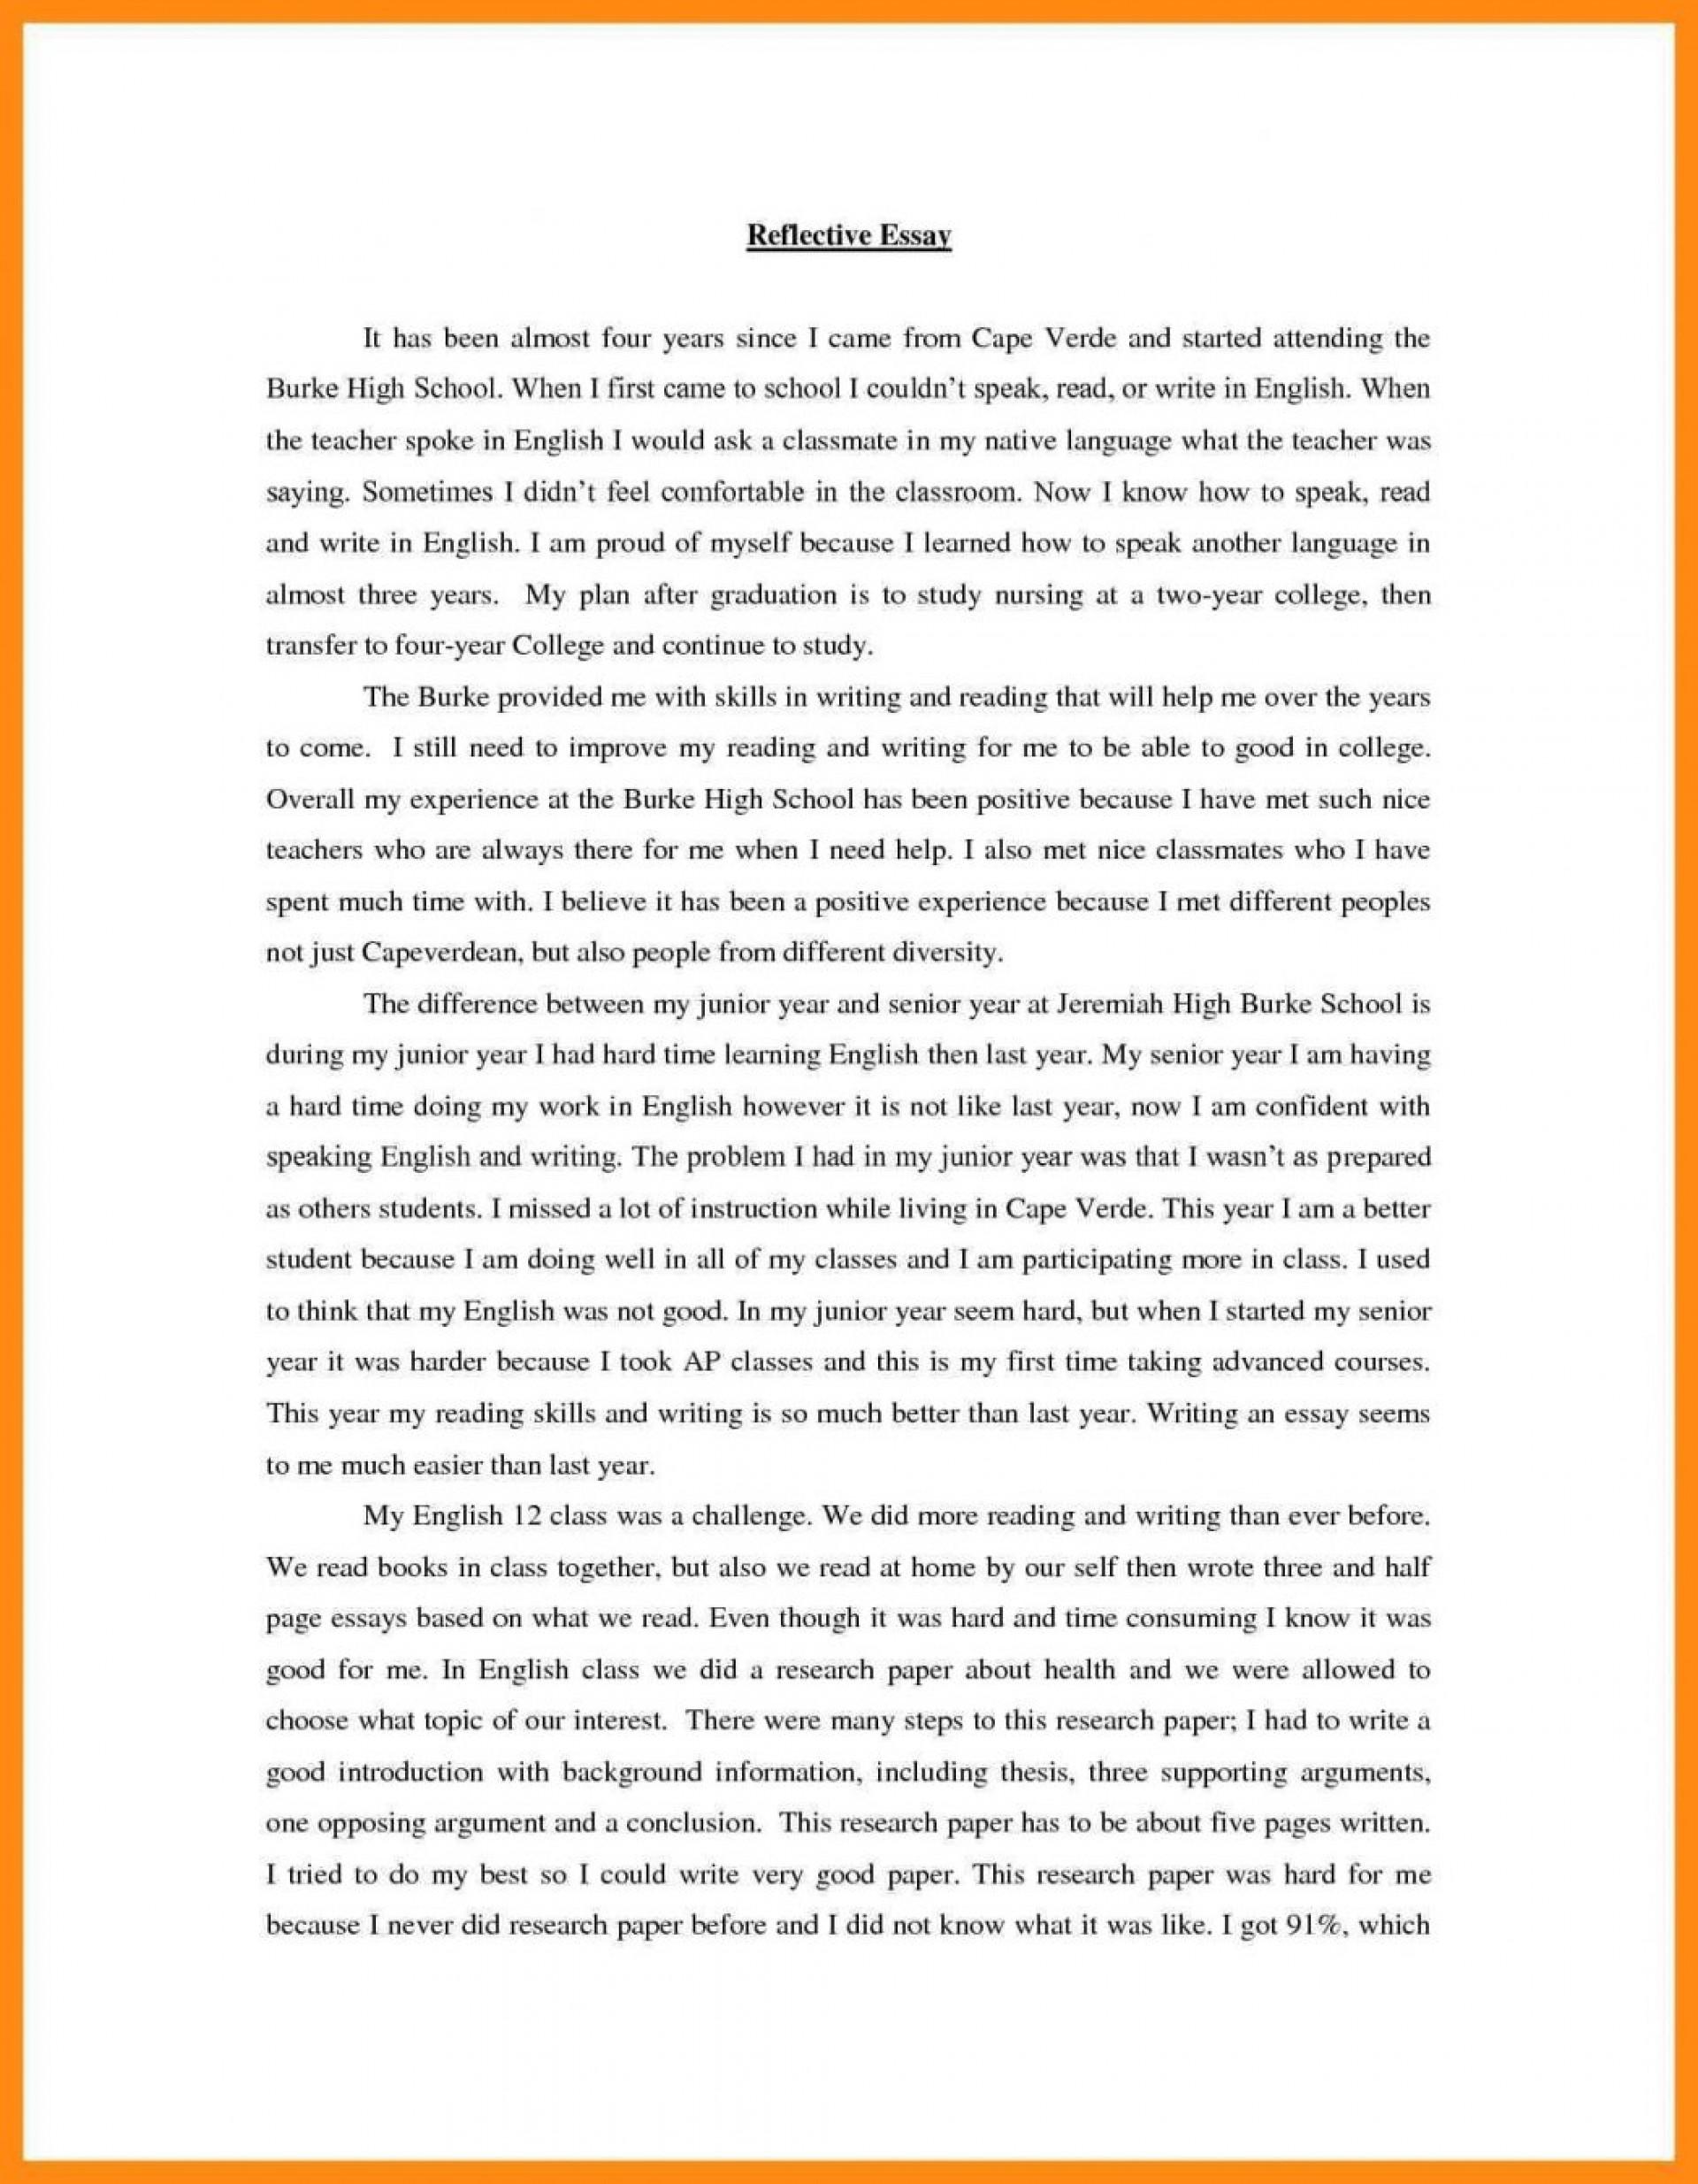 Essay writer service austin texas forecast